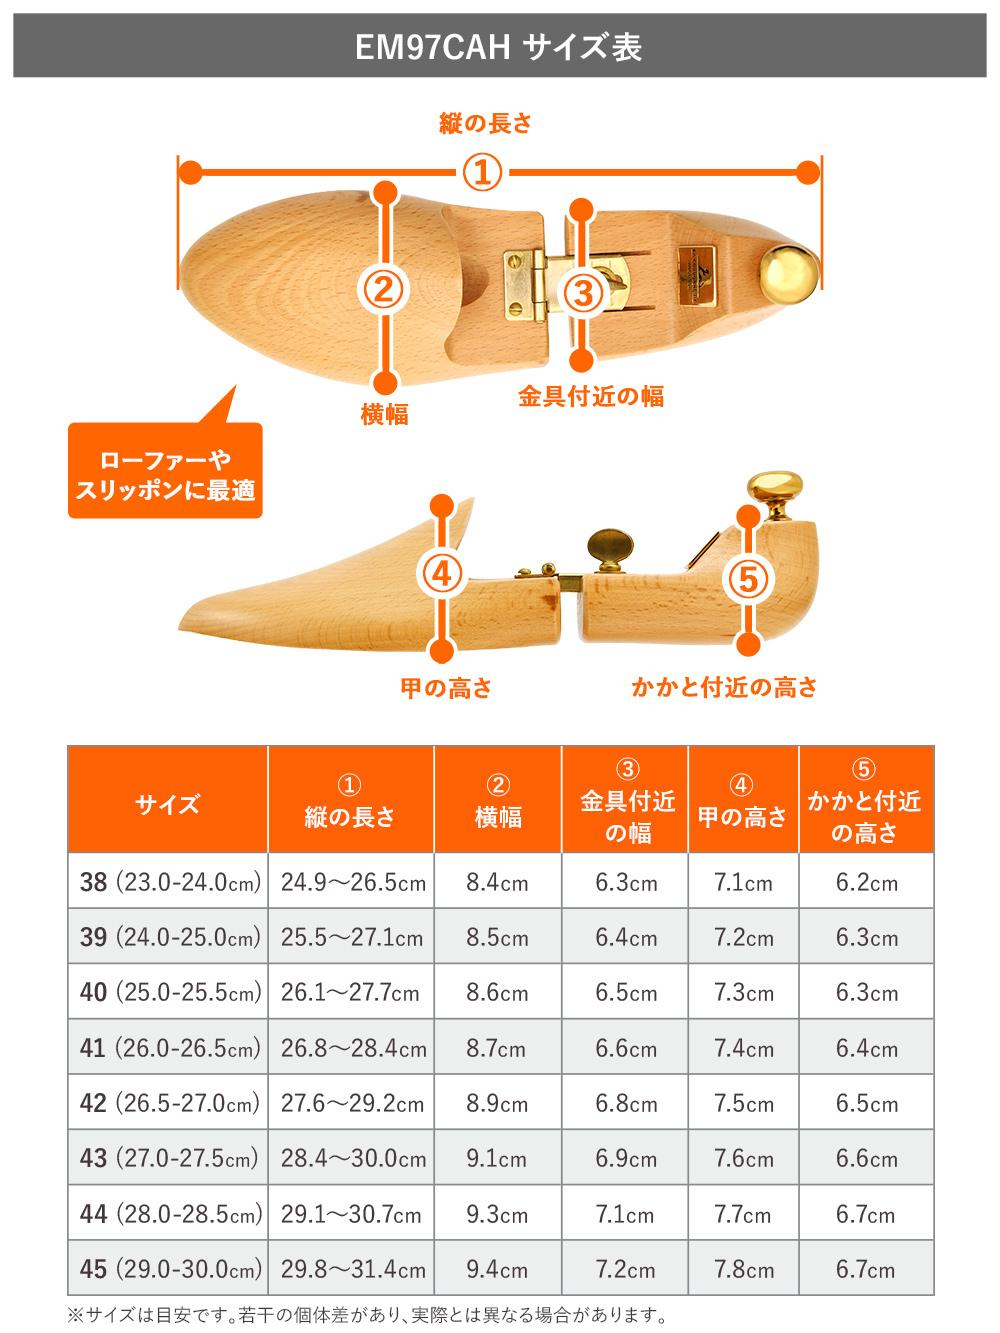 EM97CAHサイズ表